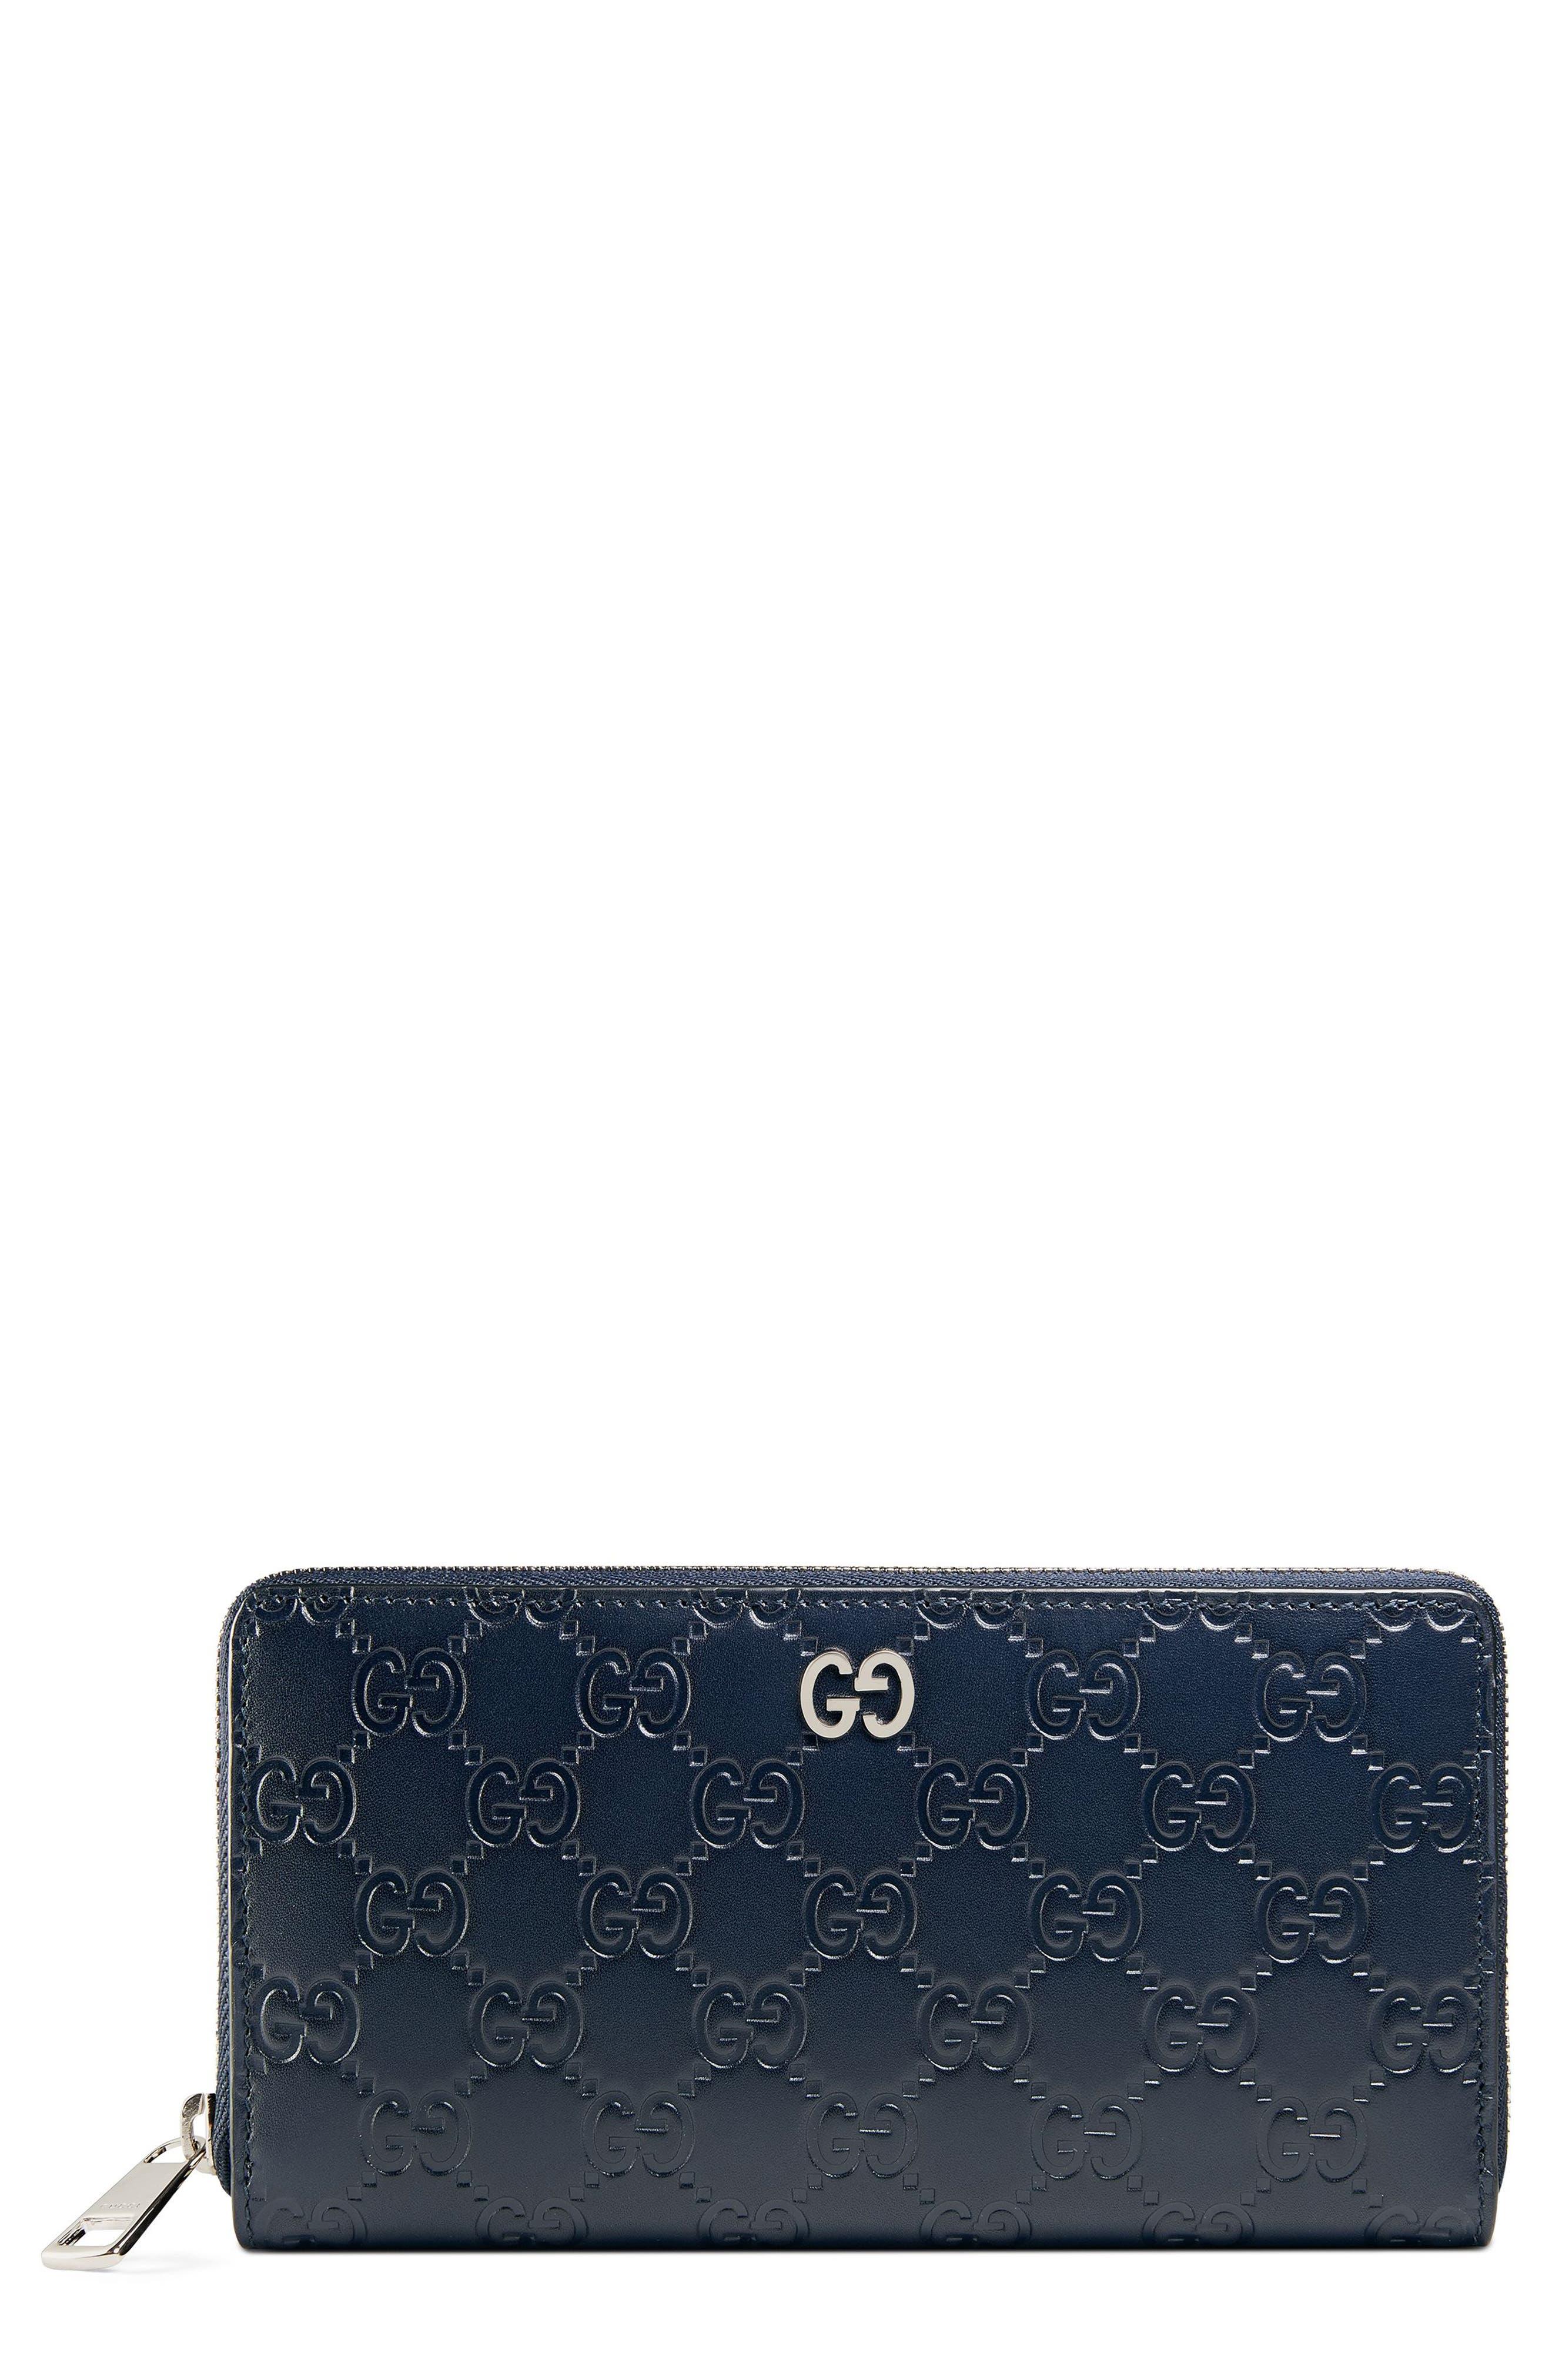 Dorian Leather Wallet,                             Main thumbnail 1, color,                             Blue